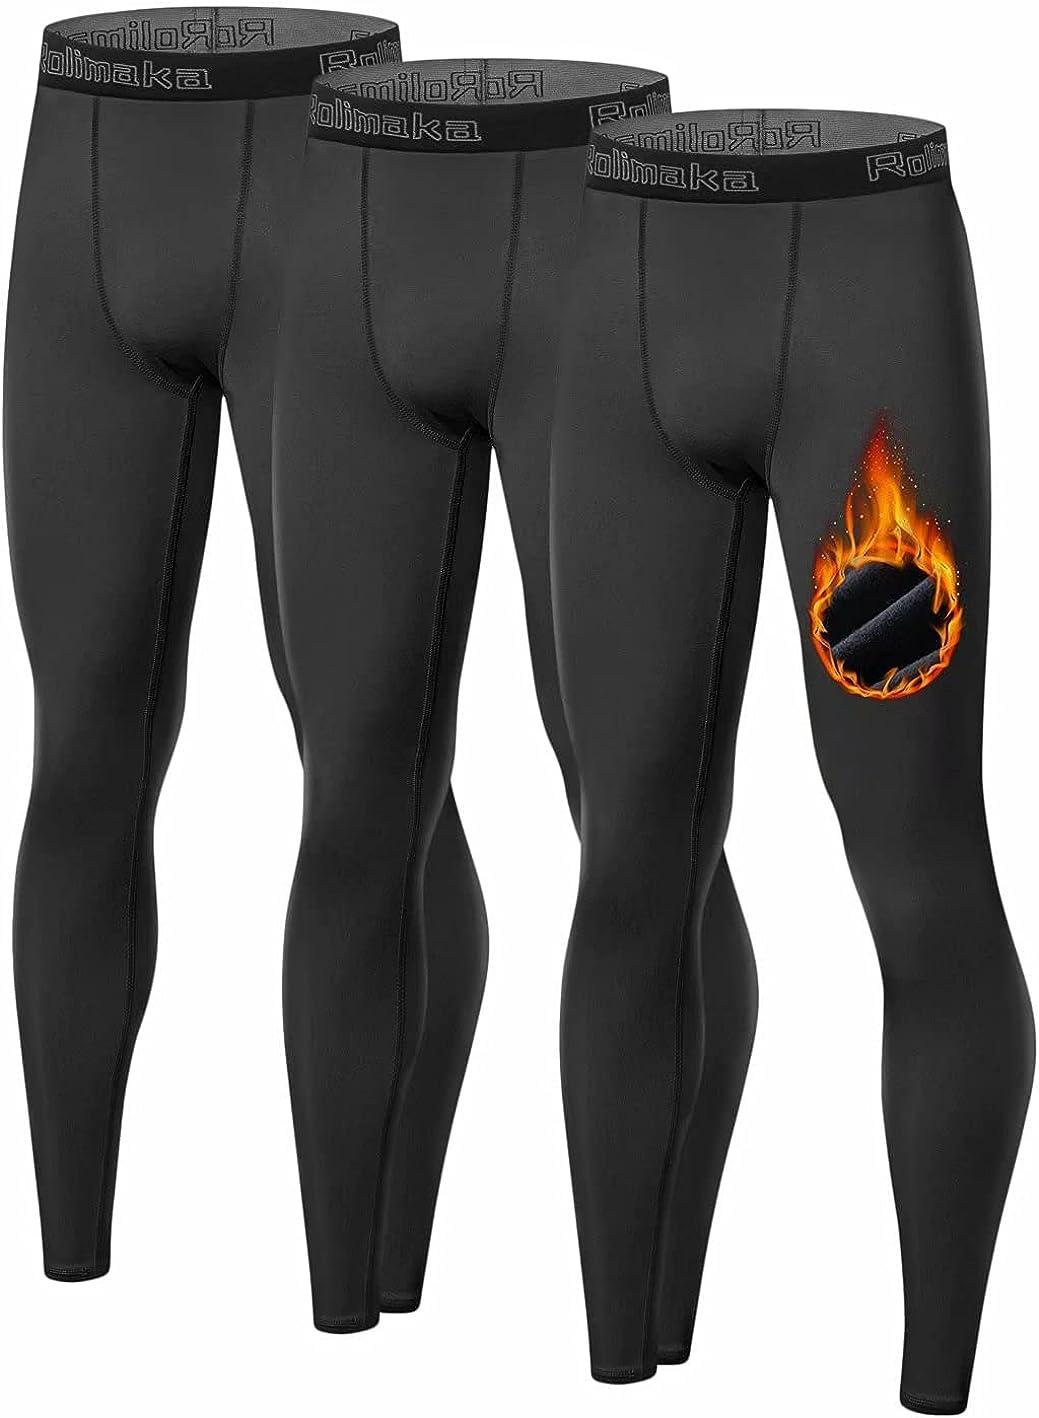 Youth Boys' Thermal Compression Leggings Sports Tights Fleece Lined Pants Big Kids' Base Layer (NO Fireball On Leg)